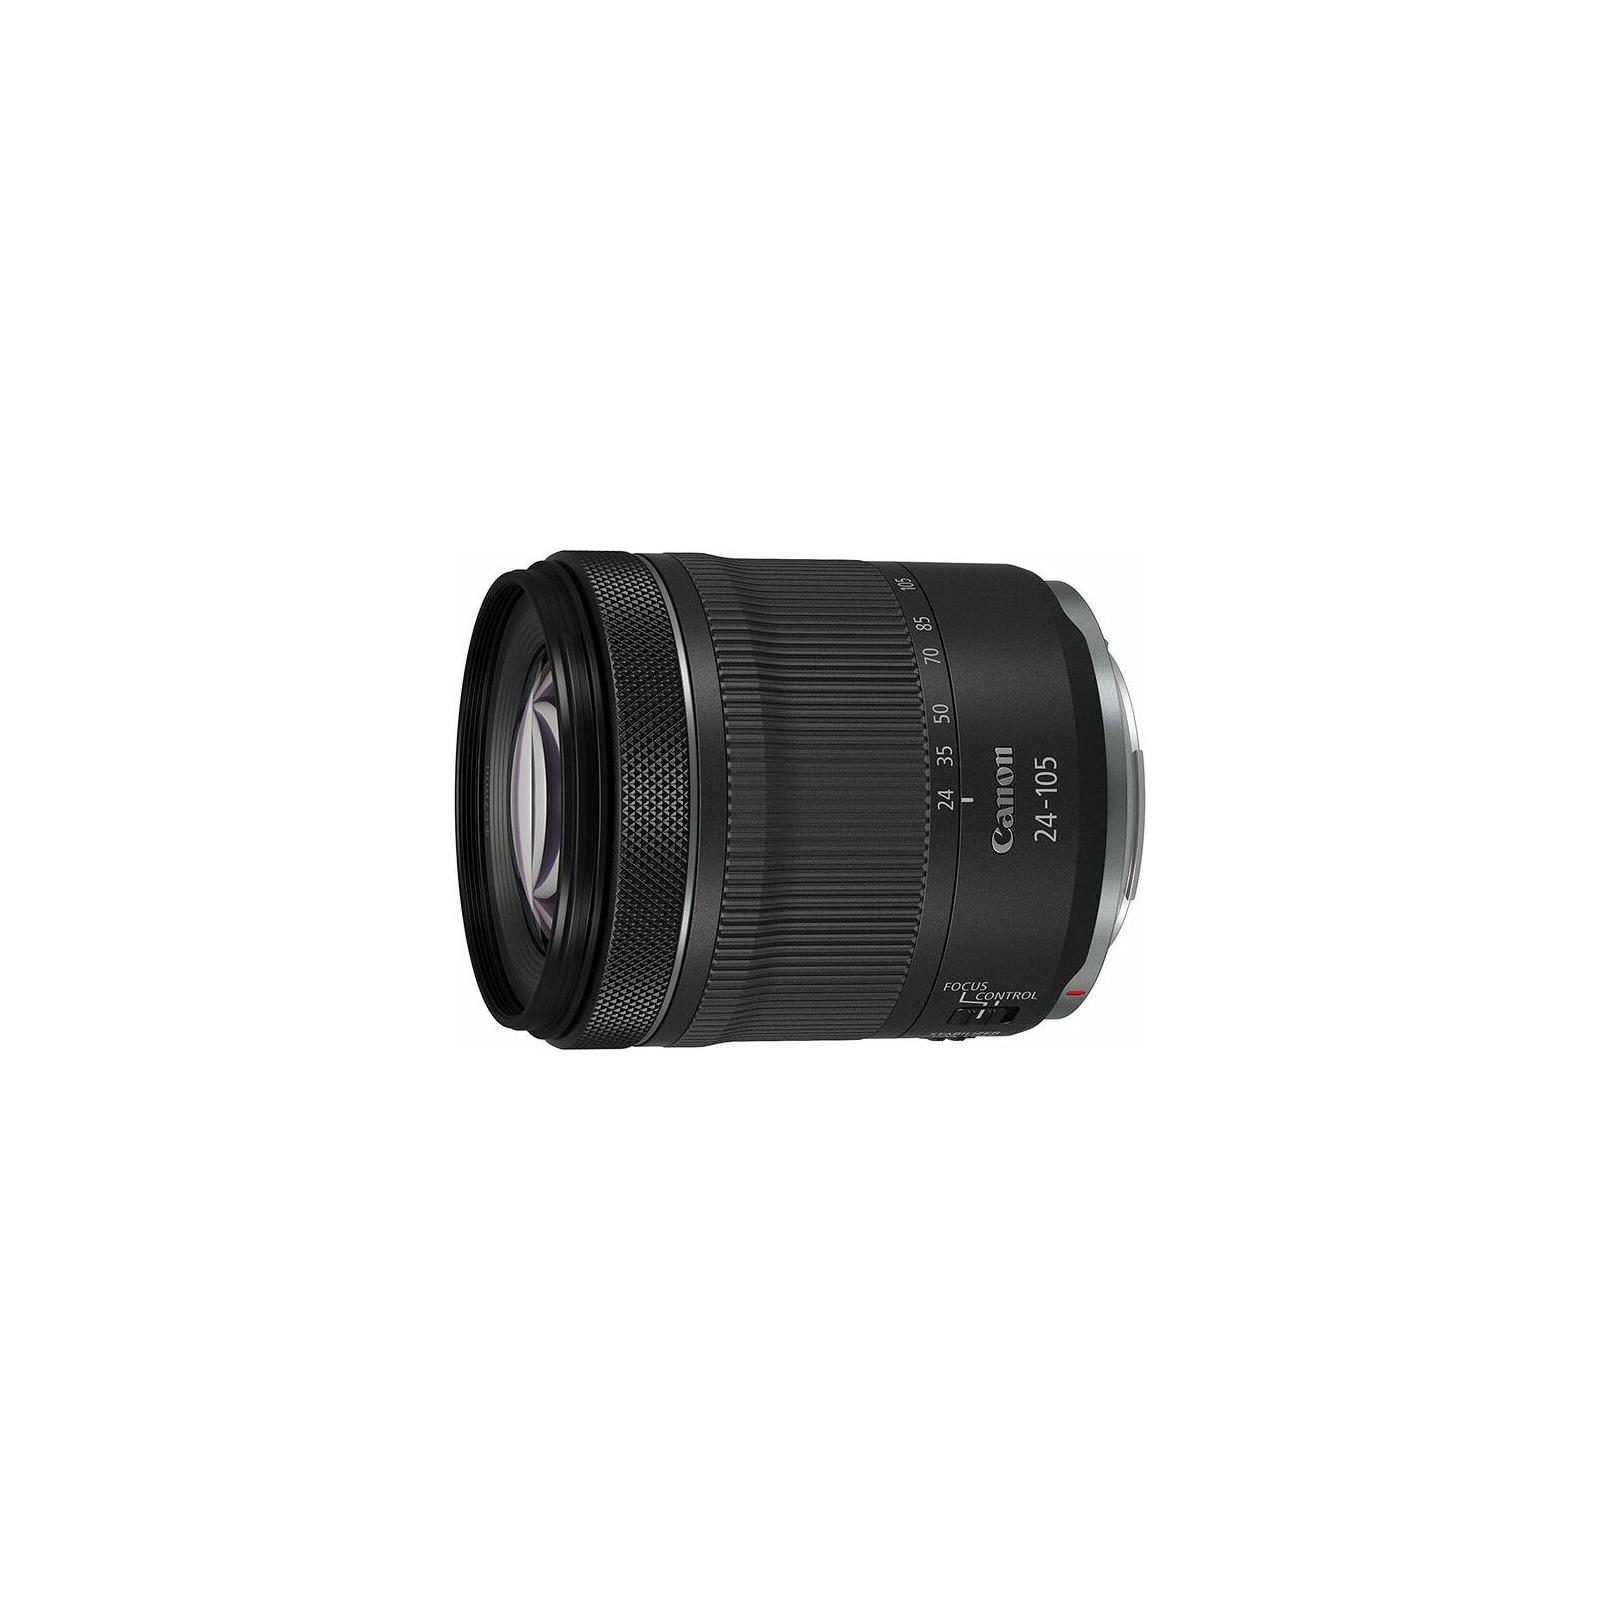 Объектив Canon RF 24-105mm f/4.0-7.1 IS STM (4111C005)